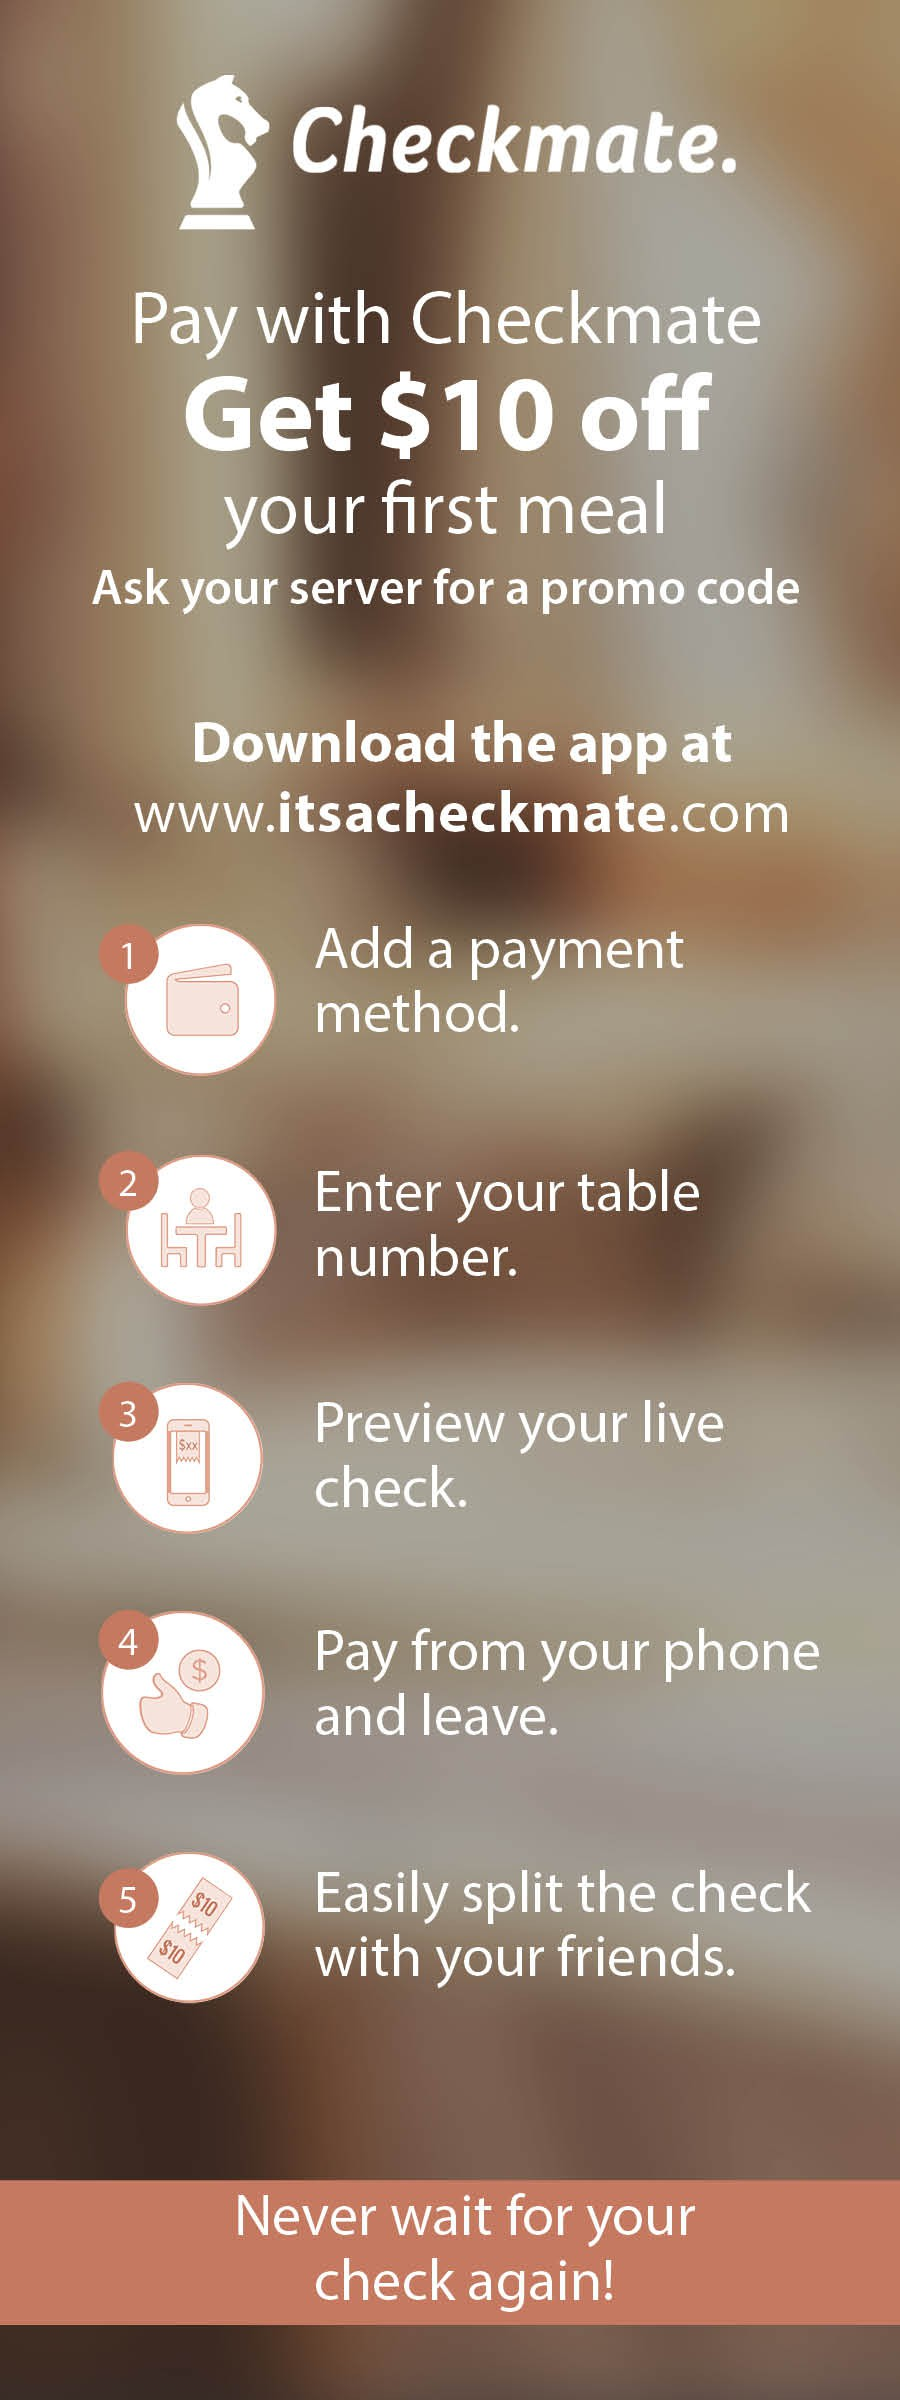 Restaurant flyer and check insert